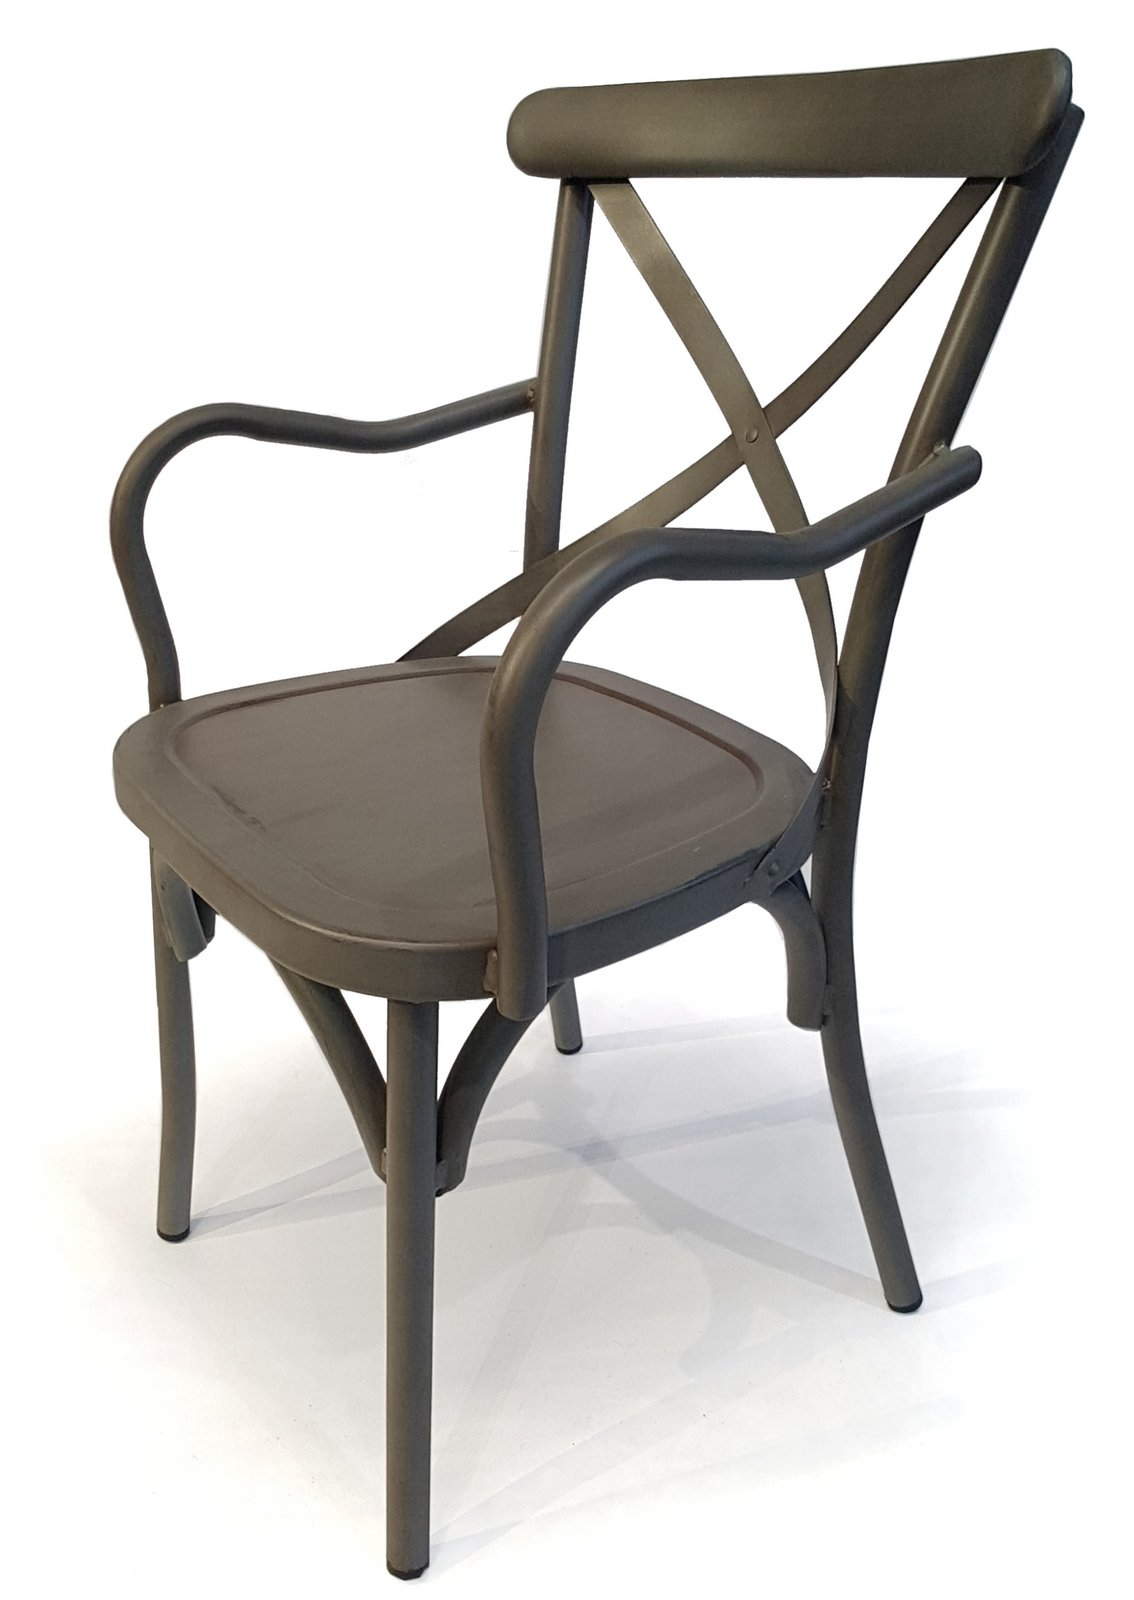 Osoltus Vintage Alu Stuhl Mit Armlehne Grau Ebay